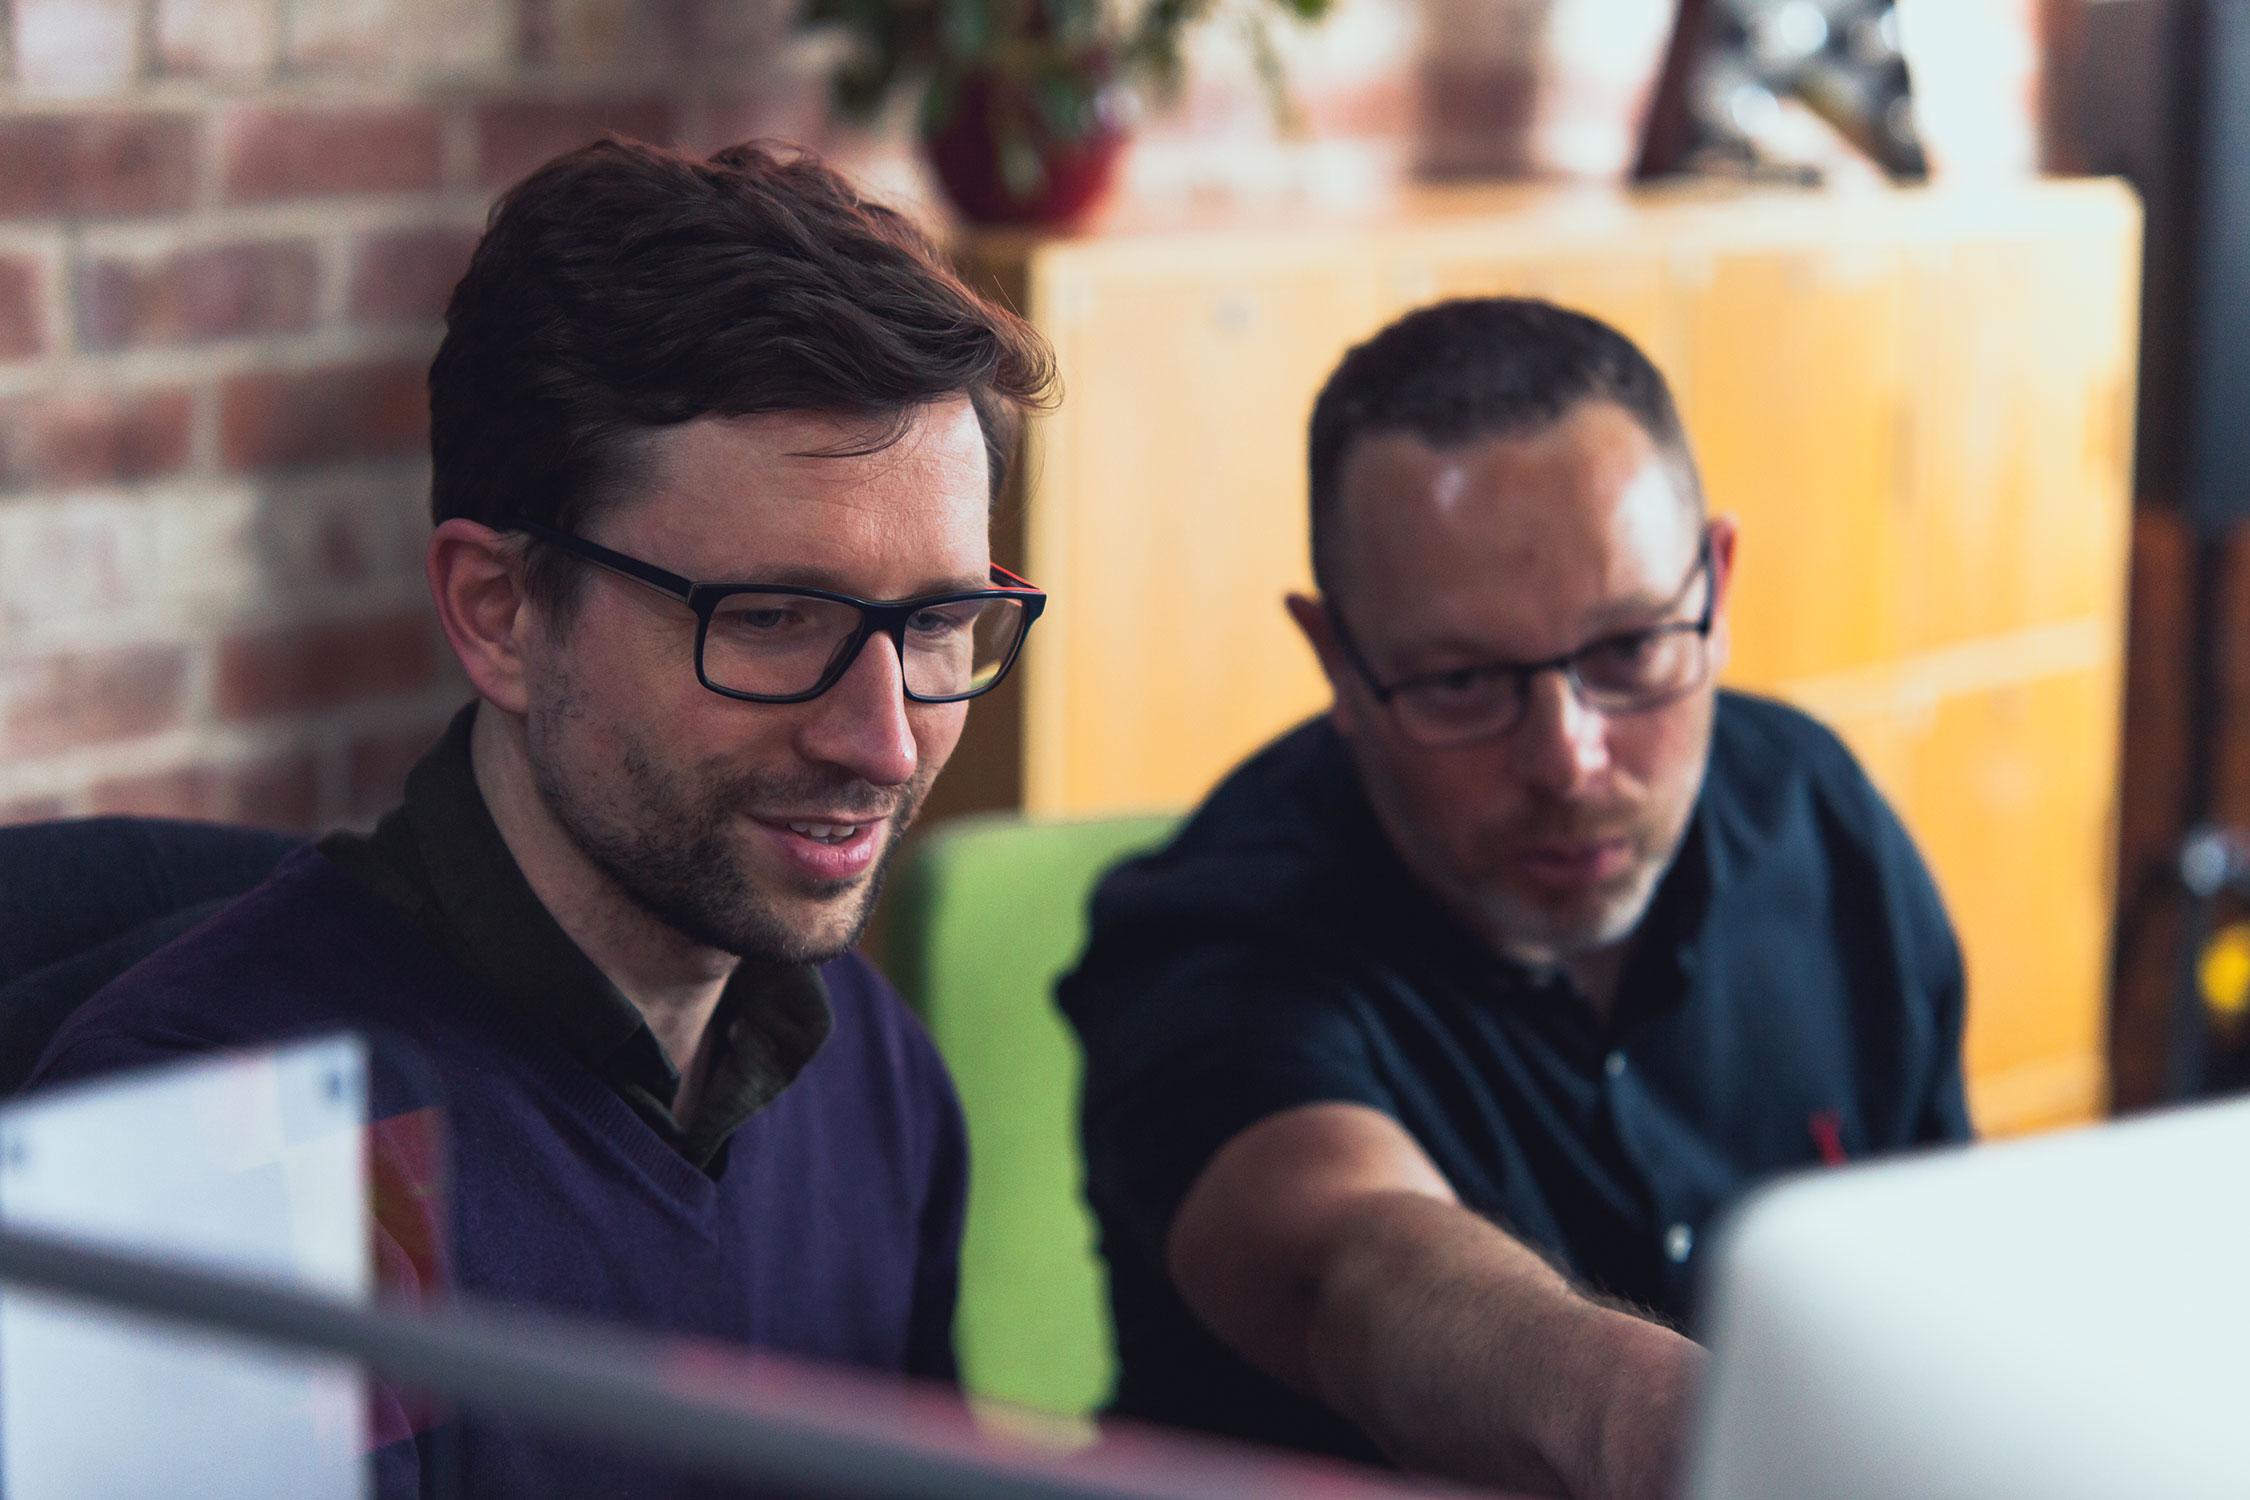 Matt Isherwood & Richard Calise discussing something on the Vivid studio Macs